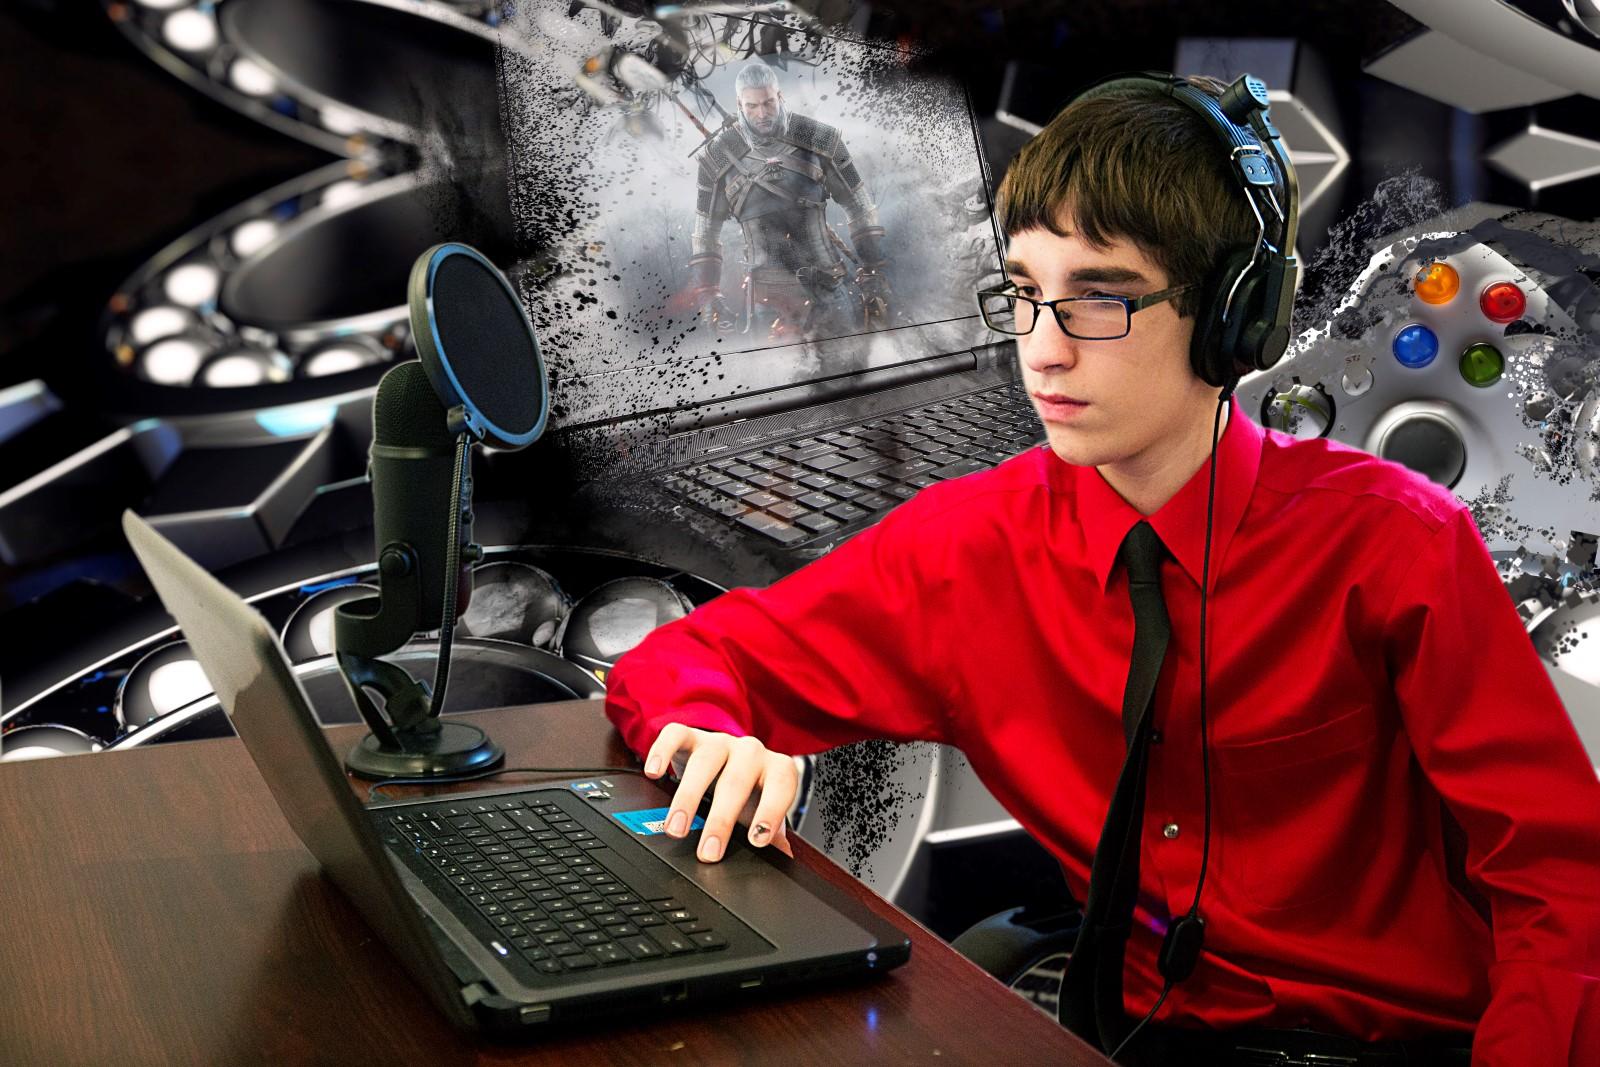 B_gamer redshirt.jpg